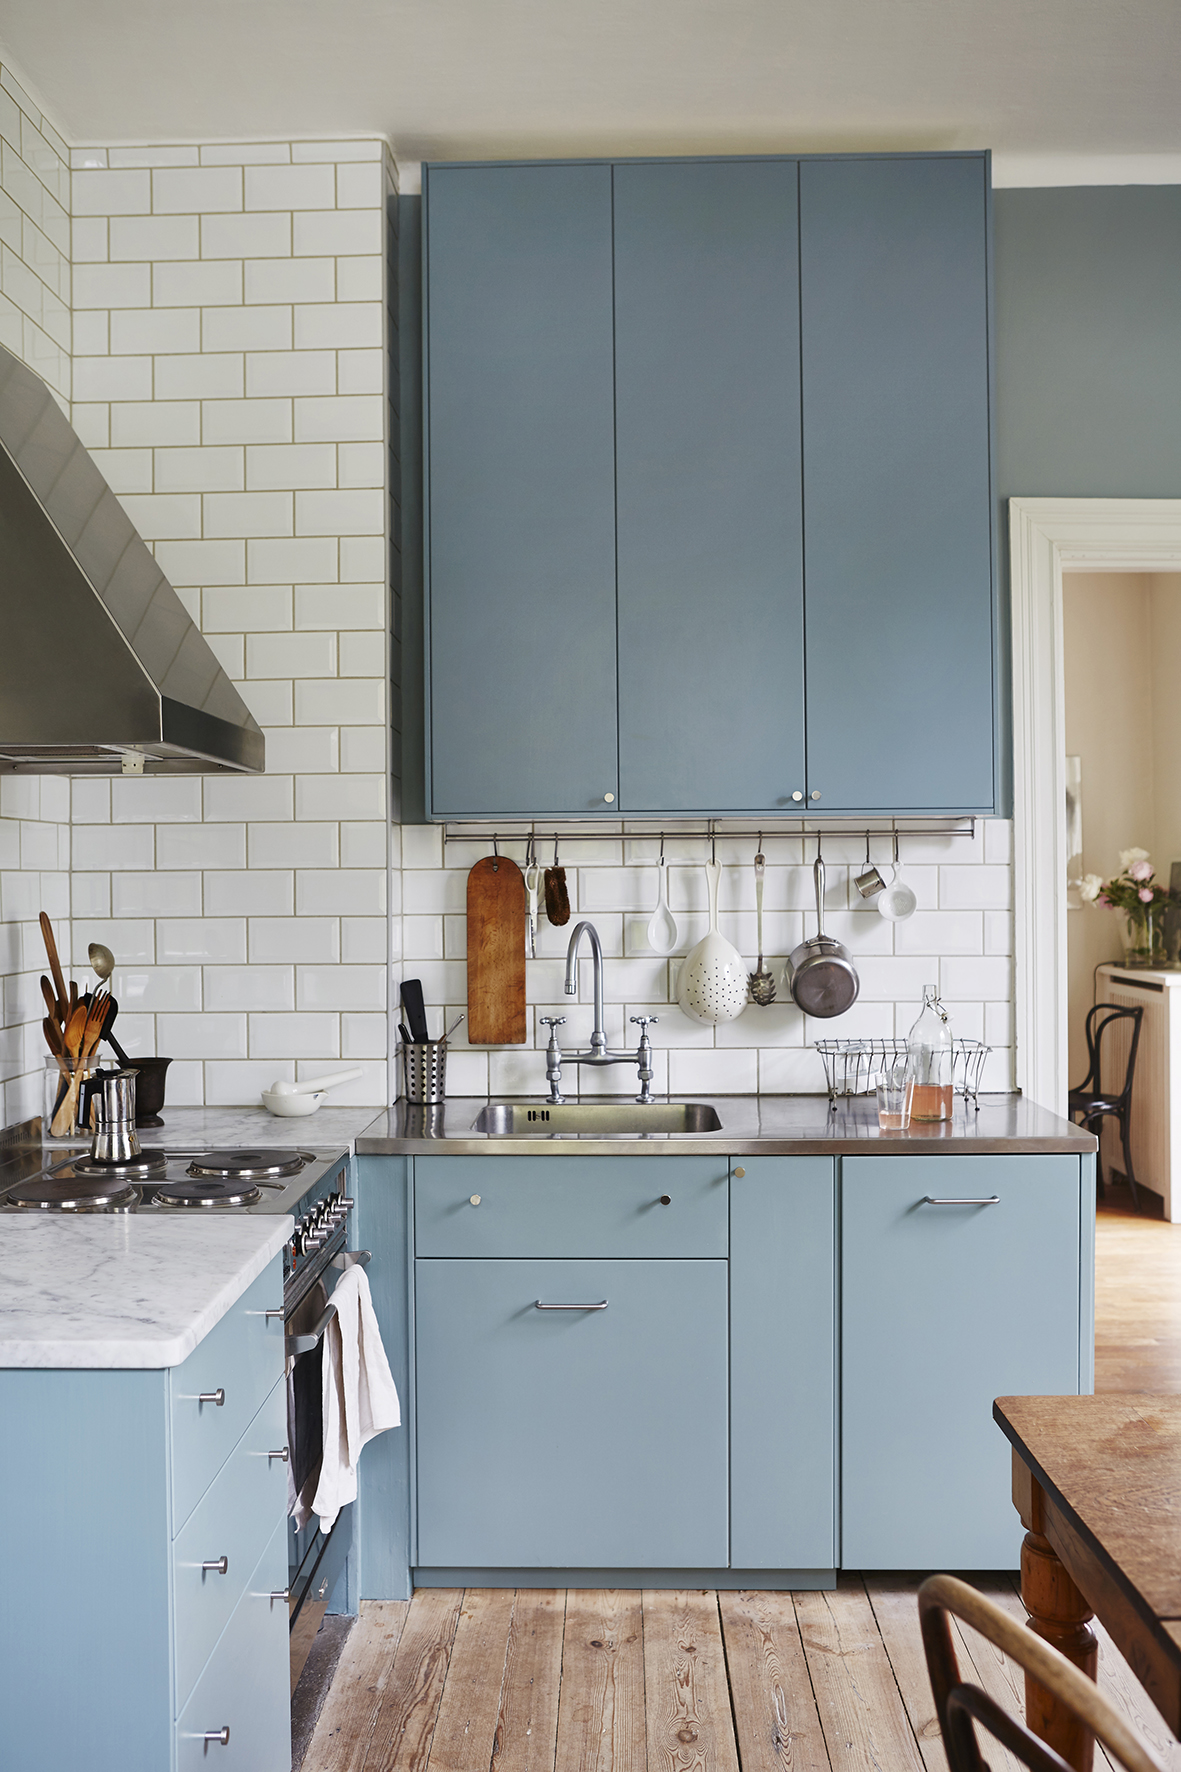 20131010-154718.jpg | *kitchen* | Pinterest | Kitchens ...